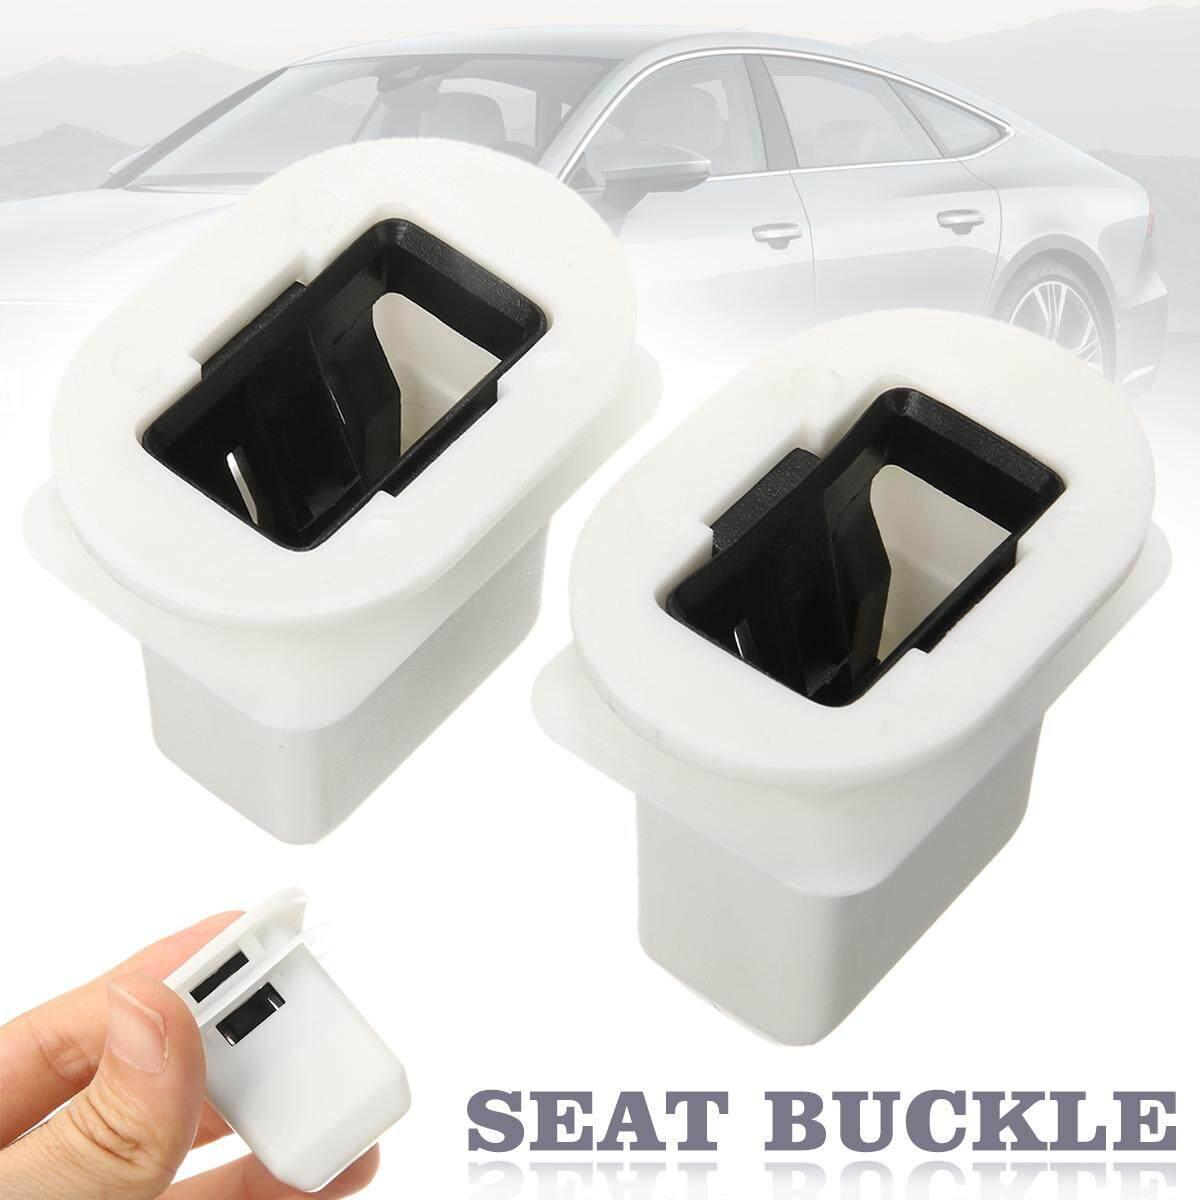 2pcs Plastic Bracket Clips Rear Seat Bench Fit For Audi Q7 A4 A6 Quattro S4 S6